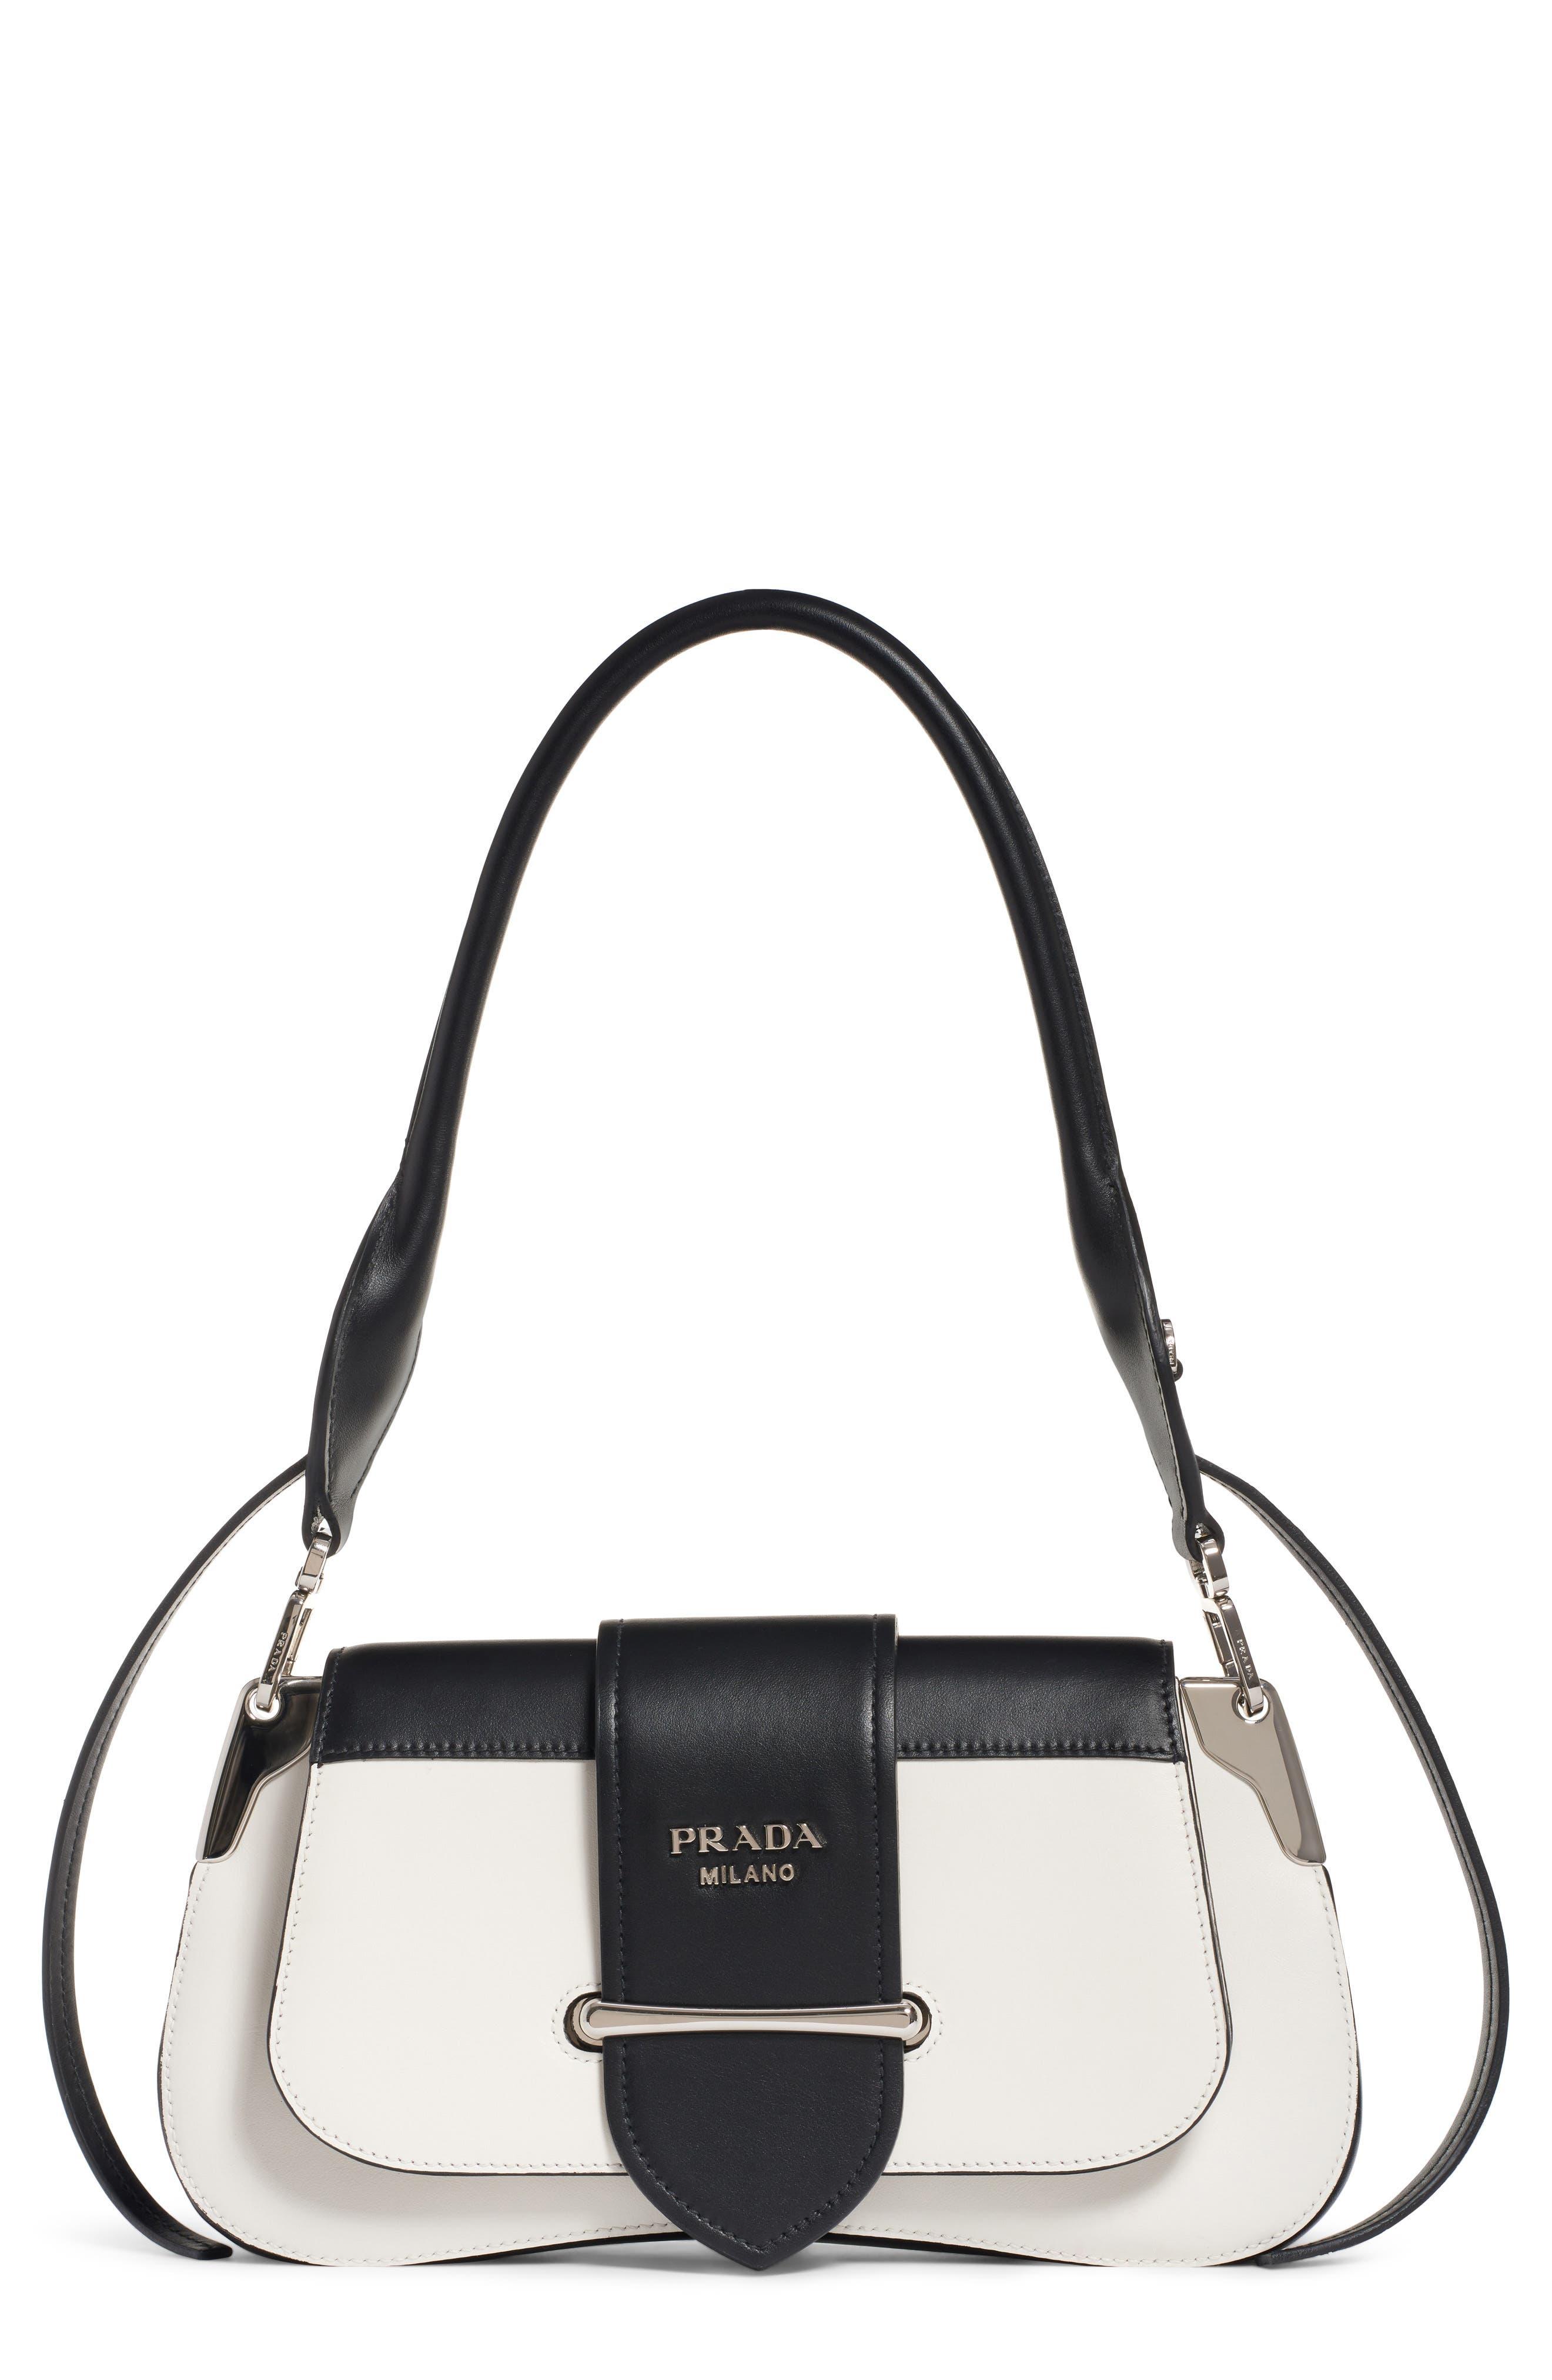 4f14359e9572 discount prada vintage prada chest rig backpack silvergrey size one size  9094b 4e096; new zealand prada sidonie bicolor calfskin leather shoulder bag  00e32 ...